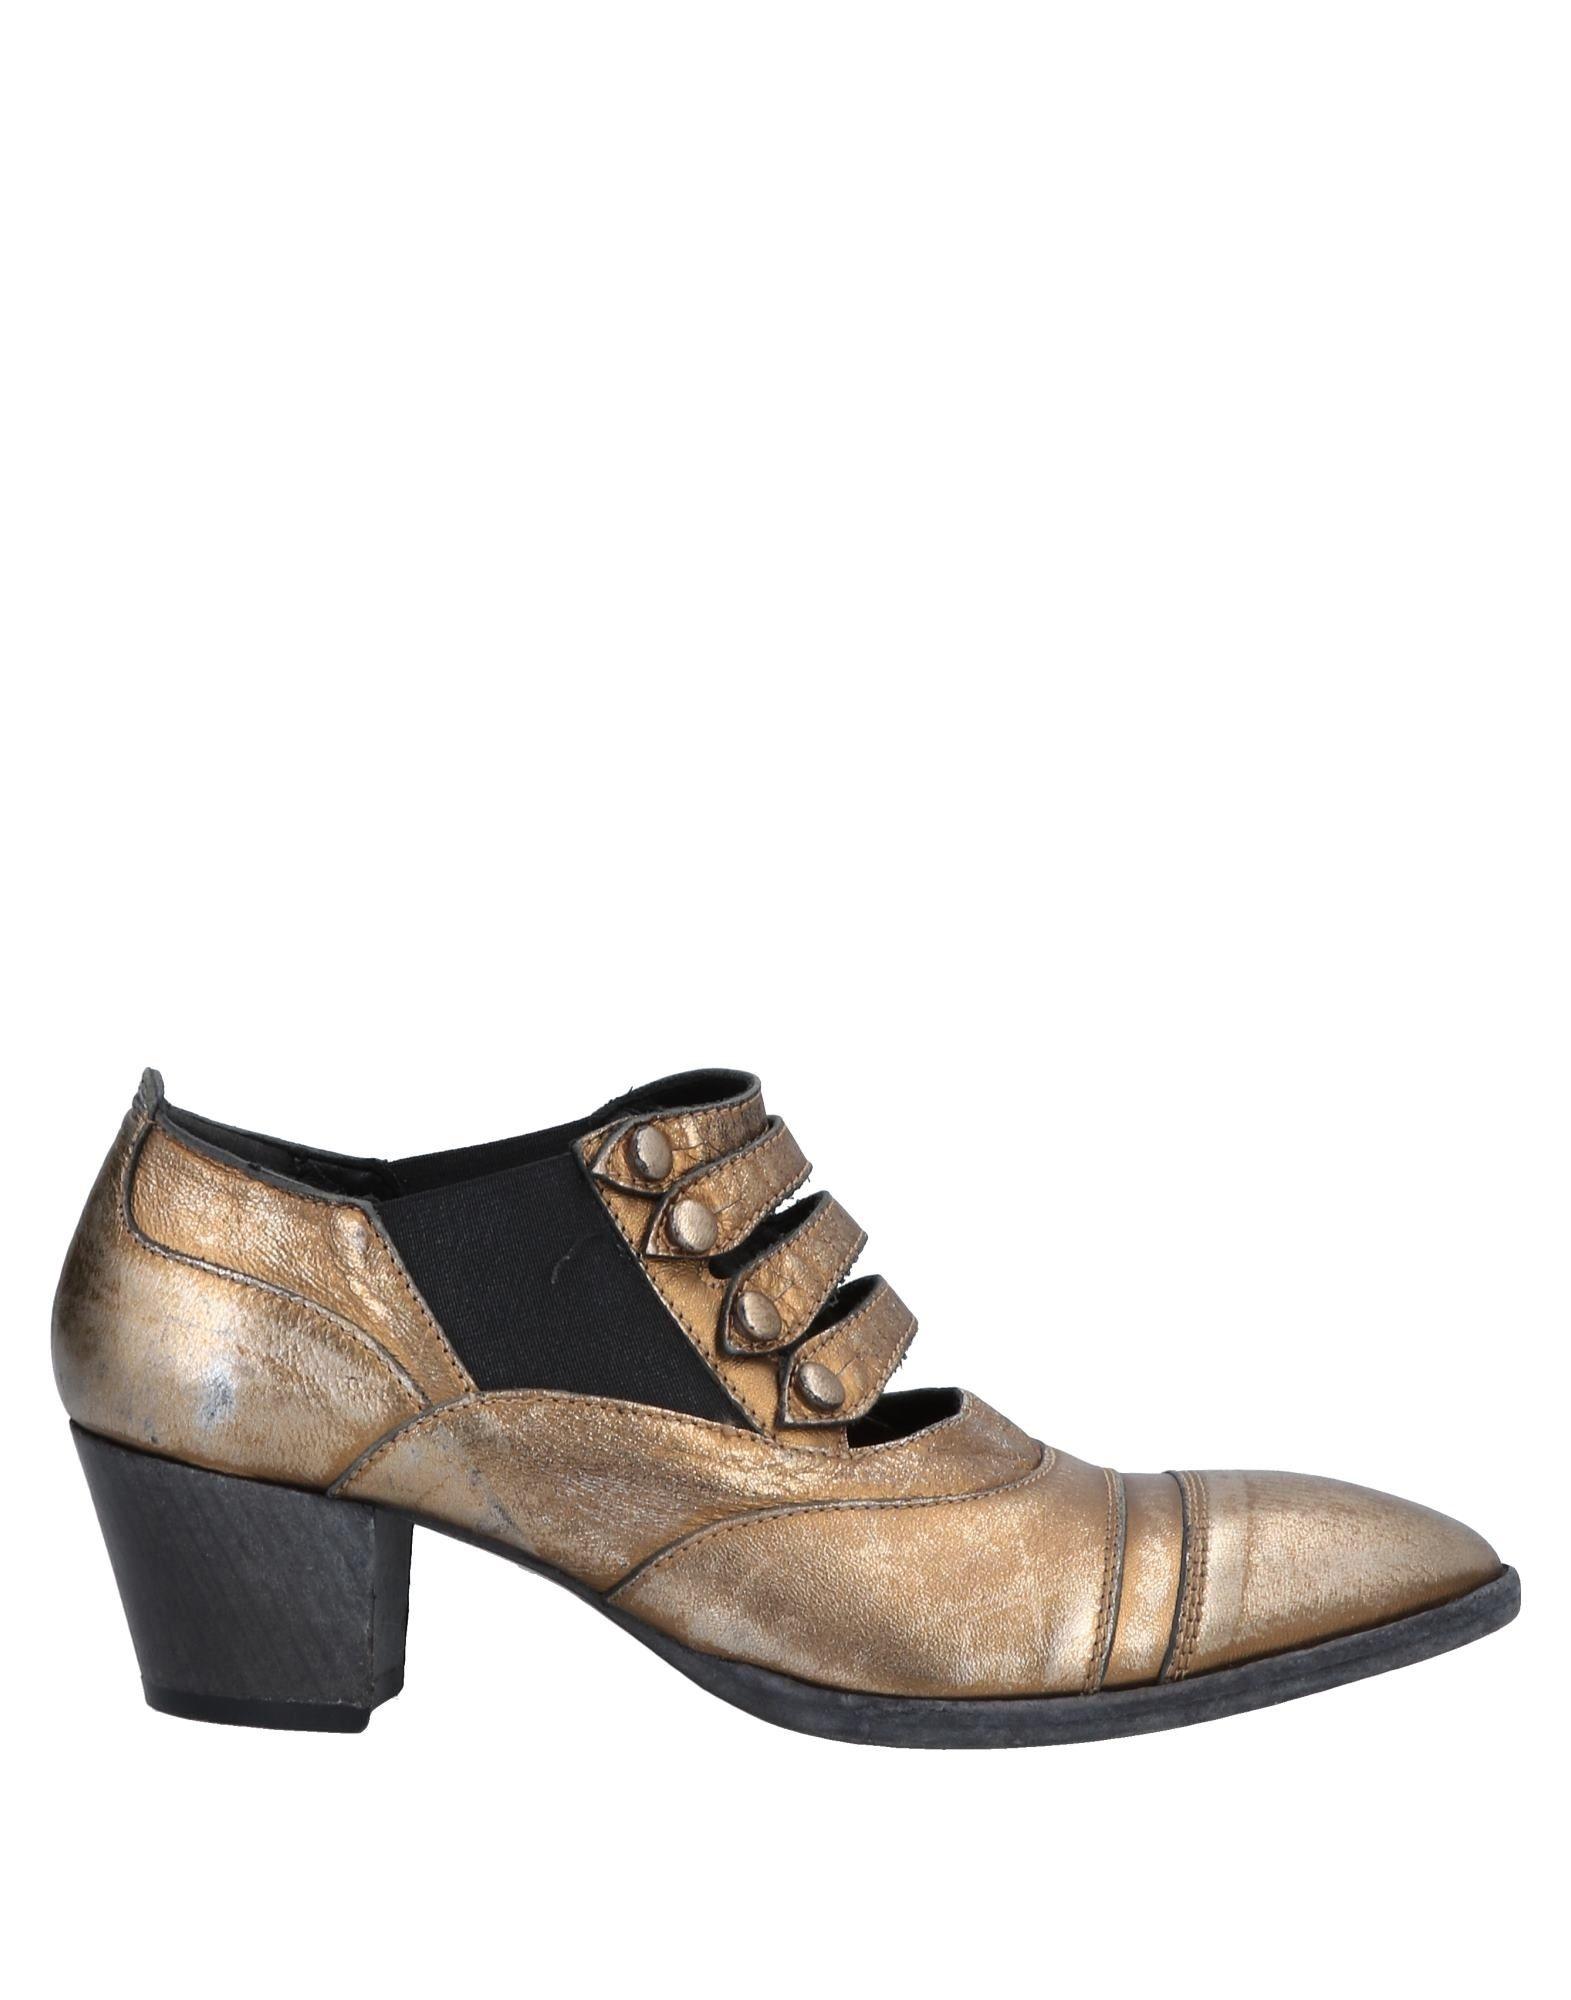 Фото - QSP+ QUELQUES SHOES DE PLUS Ботинки women high heel shoes platform pumps woman thin high heels party wedding shoes ladies kitten heels plus size 34 40 41 42 43